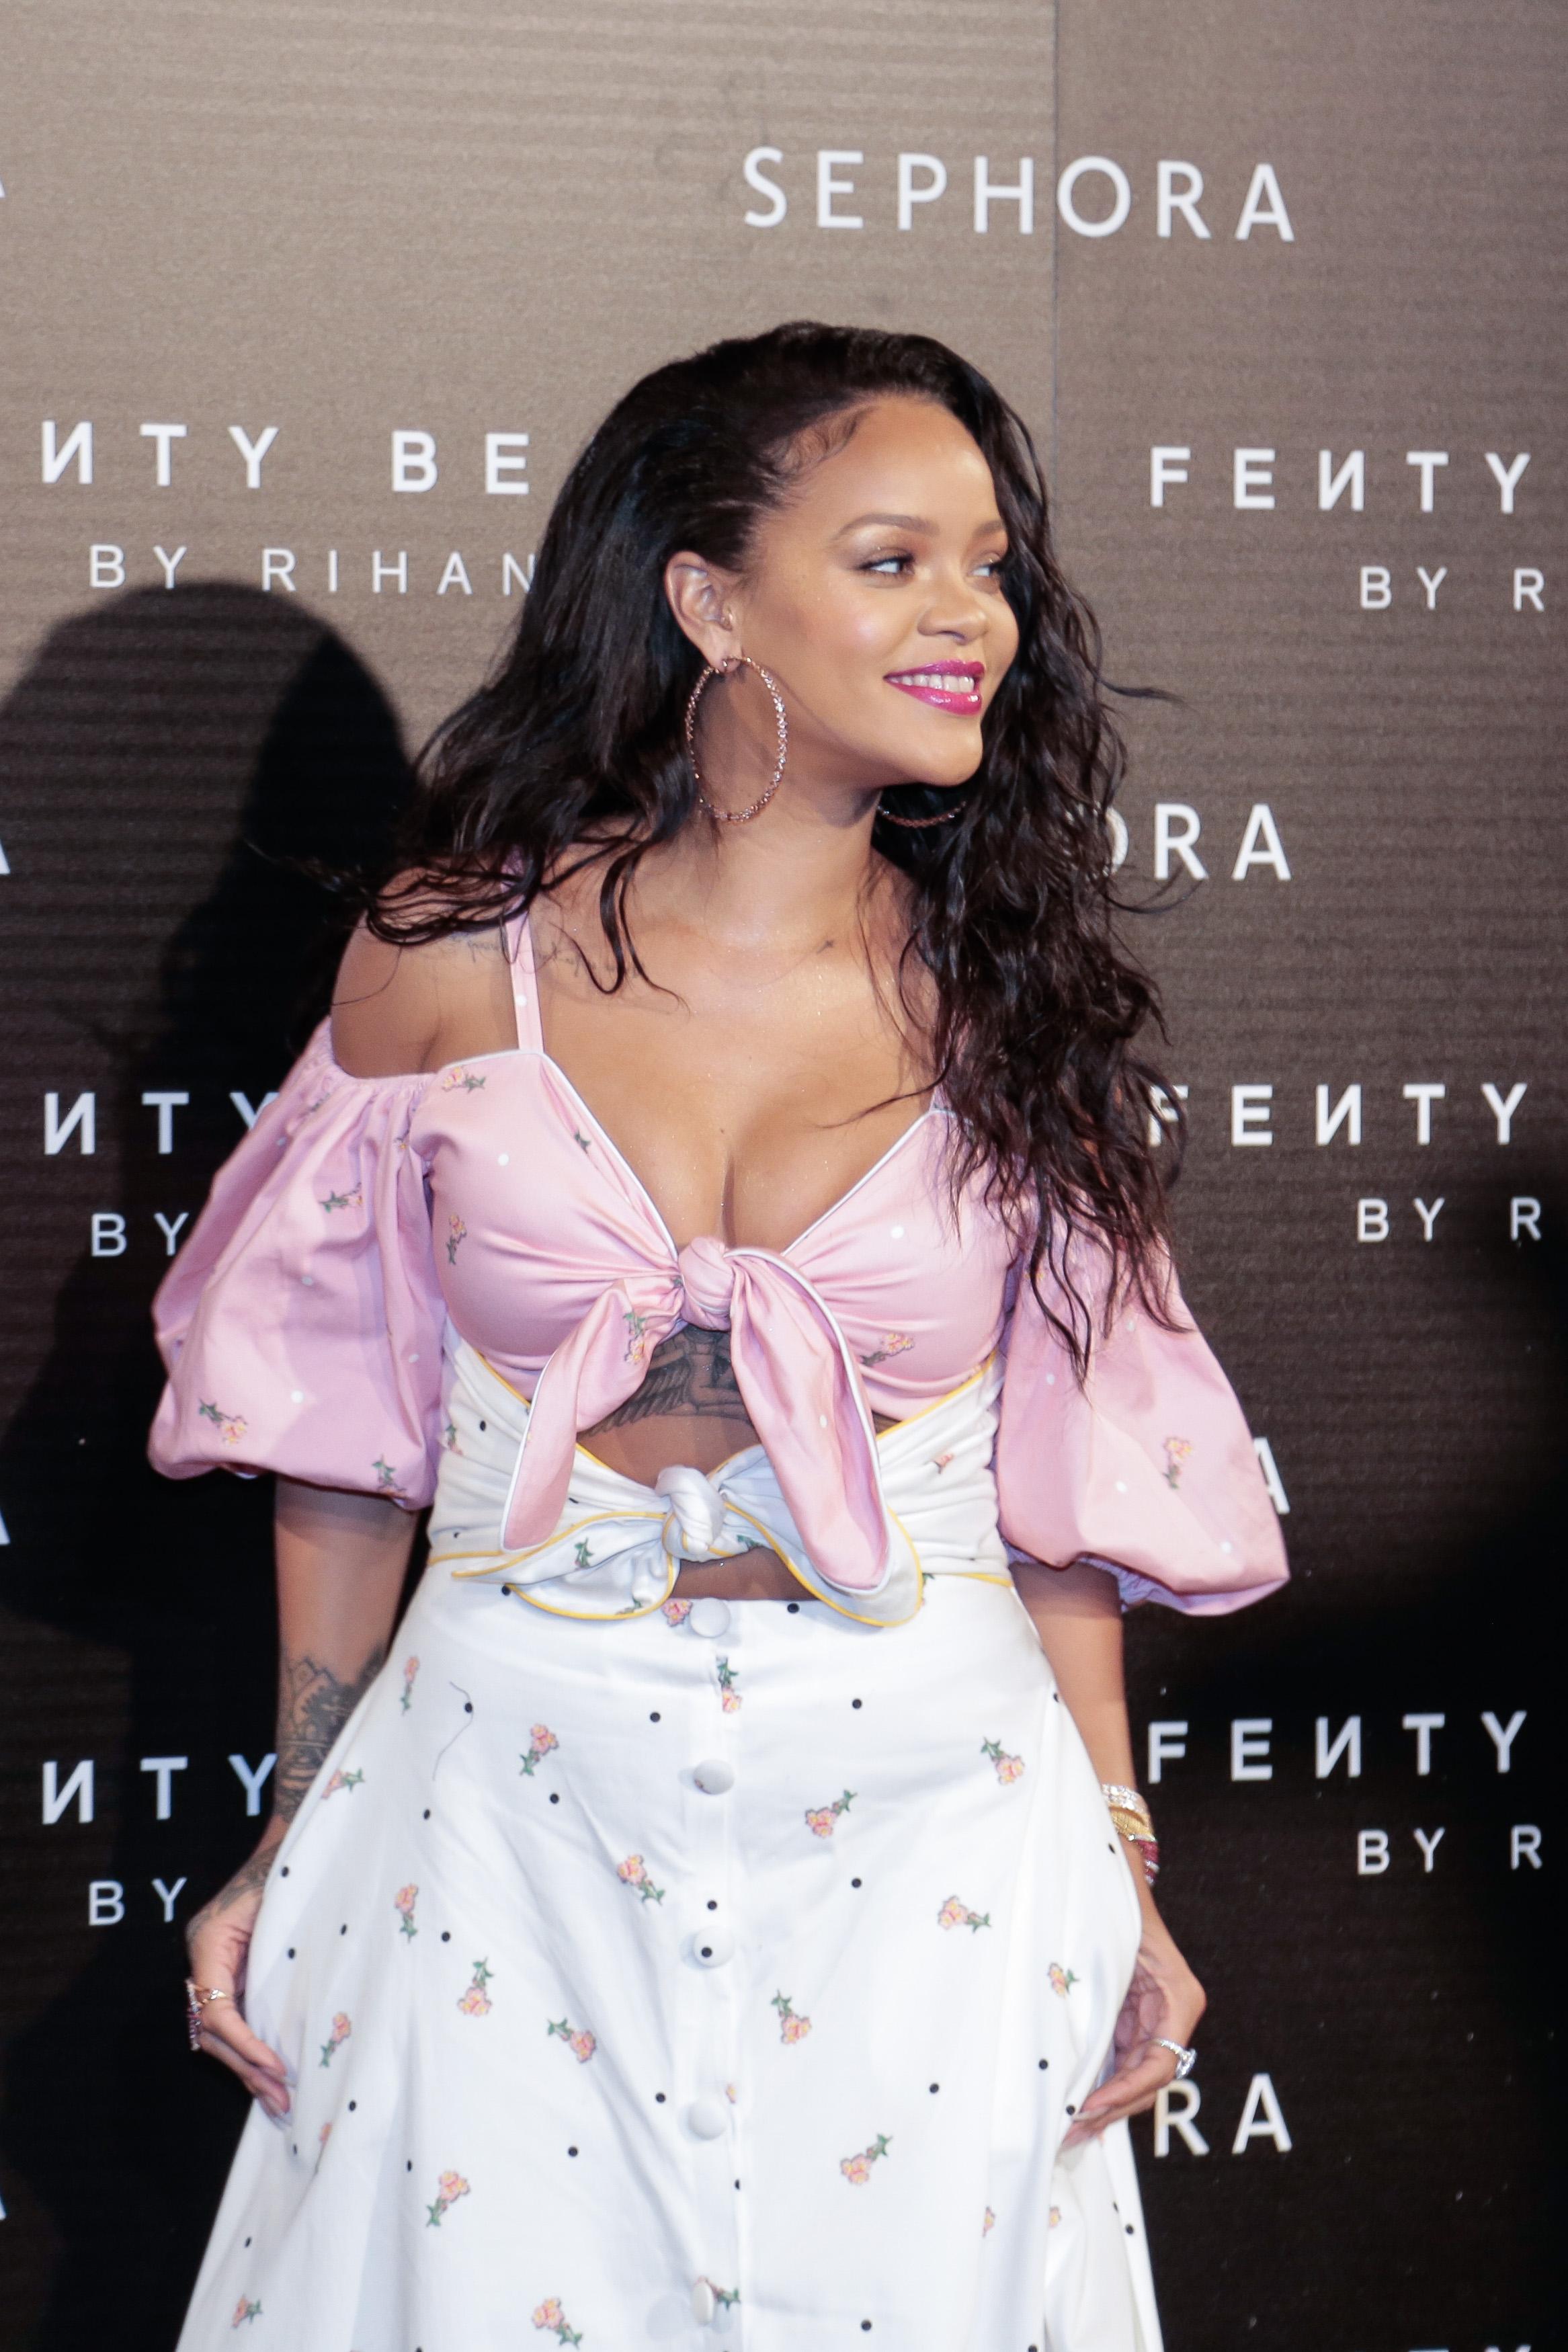 775049008EP069_Rihanna_Fent